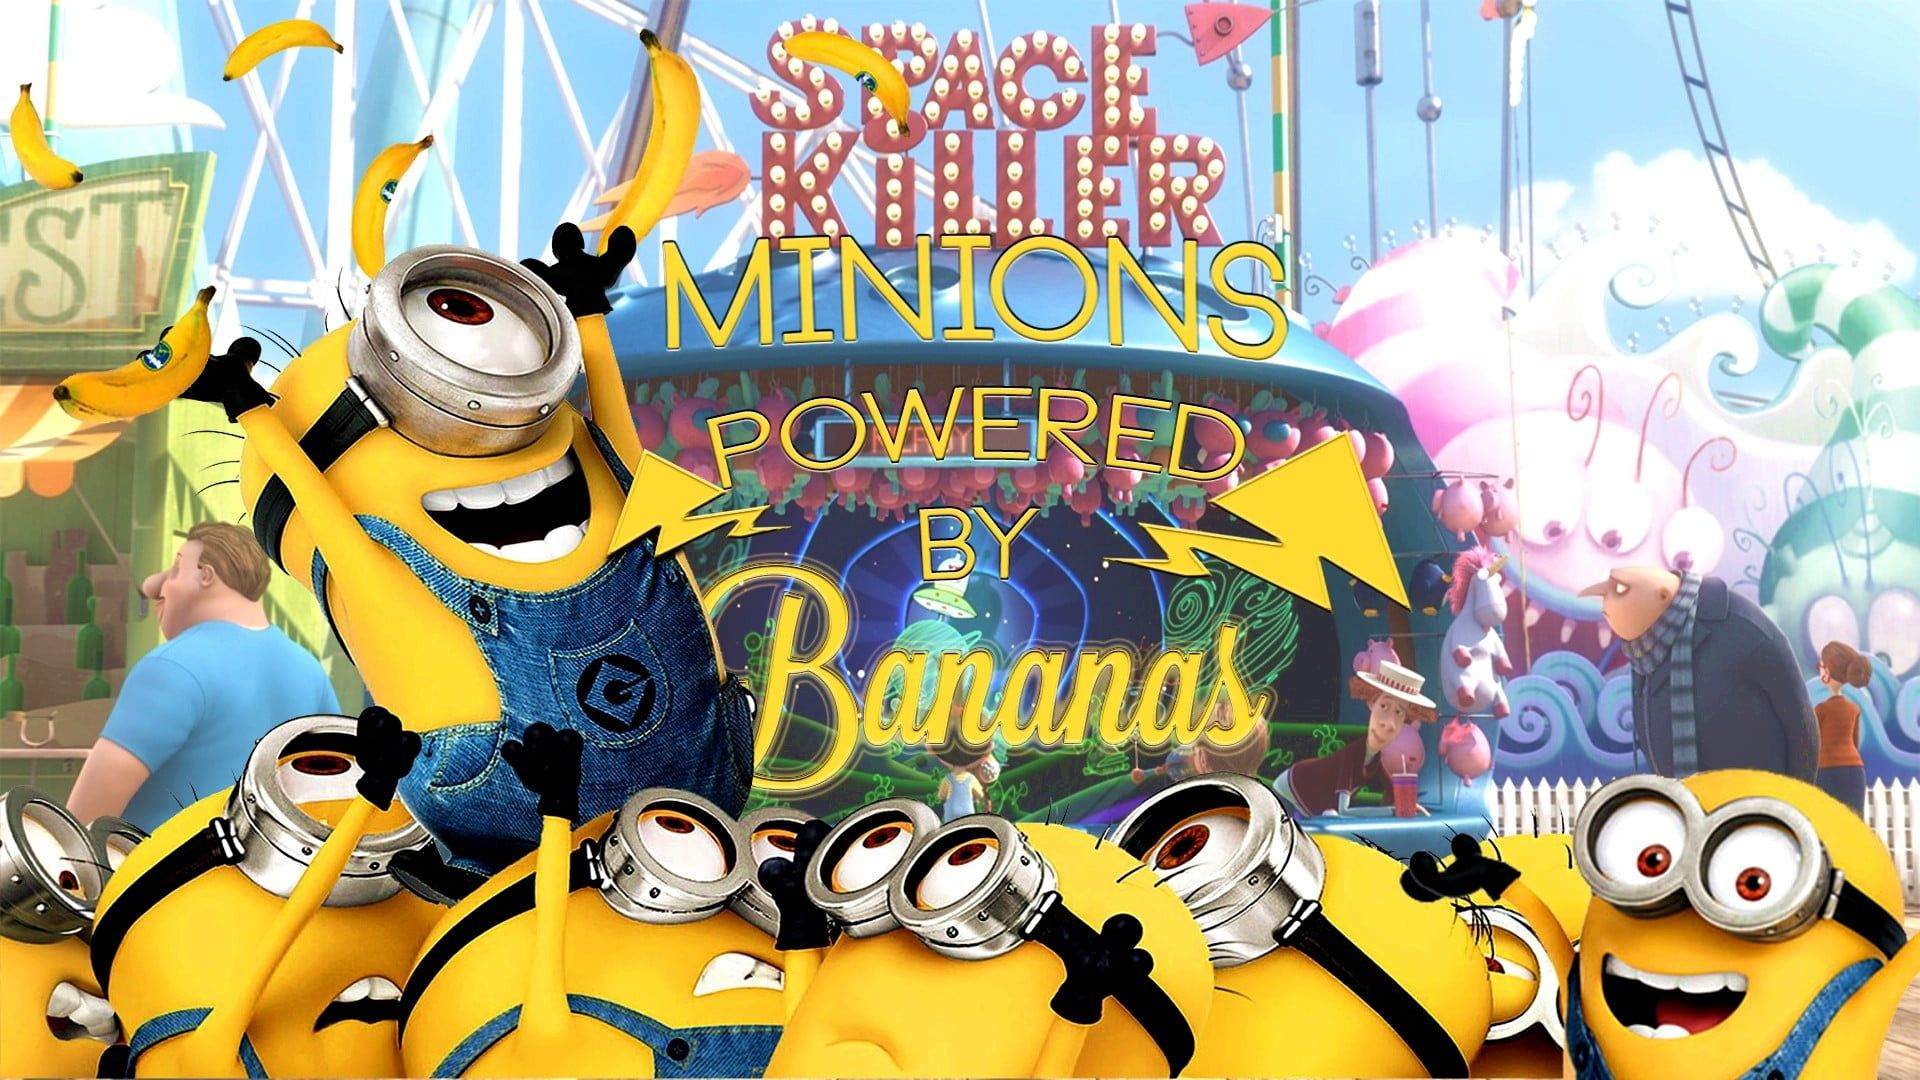 Minions Wallpaper Minions Despicable Me Bananas Happy 1080p Wallpaper Hdwallpaper Desktop Minions Wallpaper Minions Hd Wallpaper